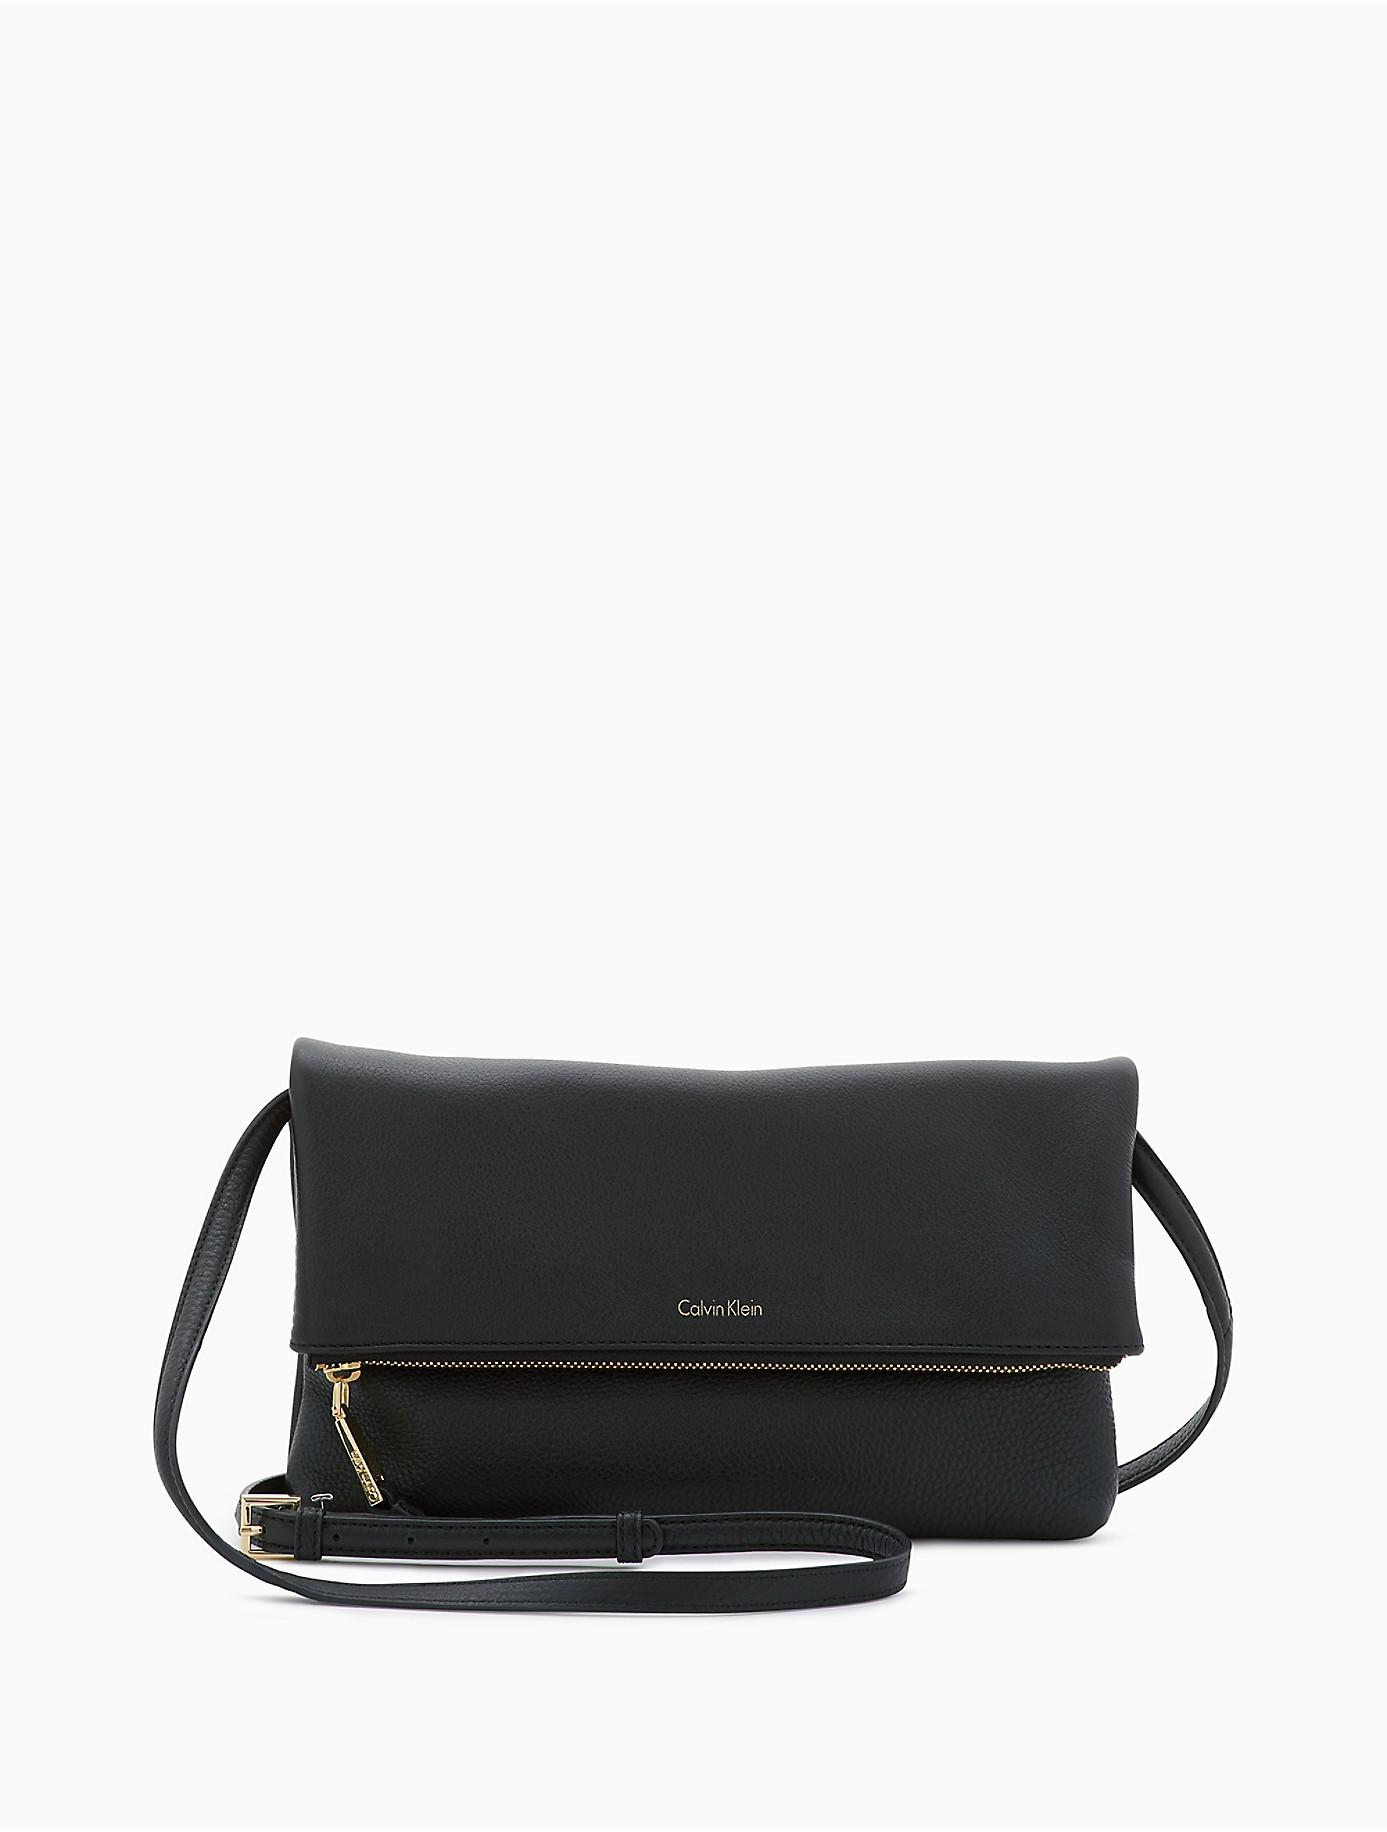 embossed crossbody bag - Black CALVIN KLEIN 205W39NYC kLfPqBfqA